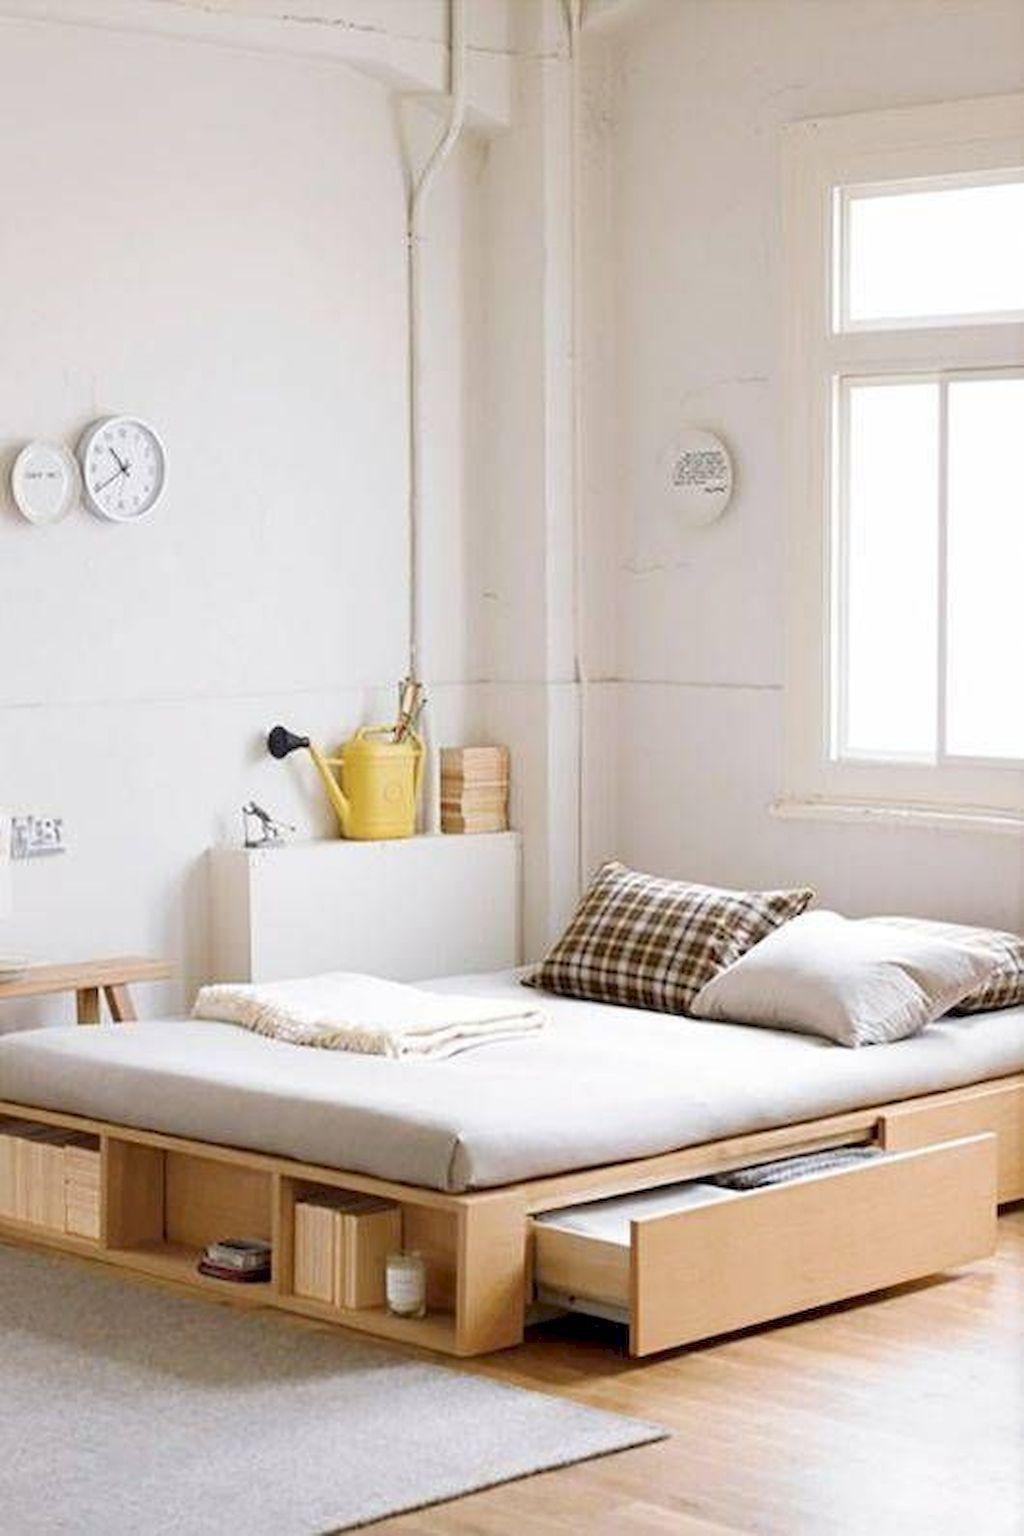 Wondrous Diy Cabinet Concepts For Your Small Bedroom Diy Ideas Best Image Libraries Weasiibadanjobscom